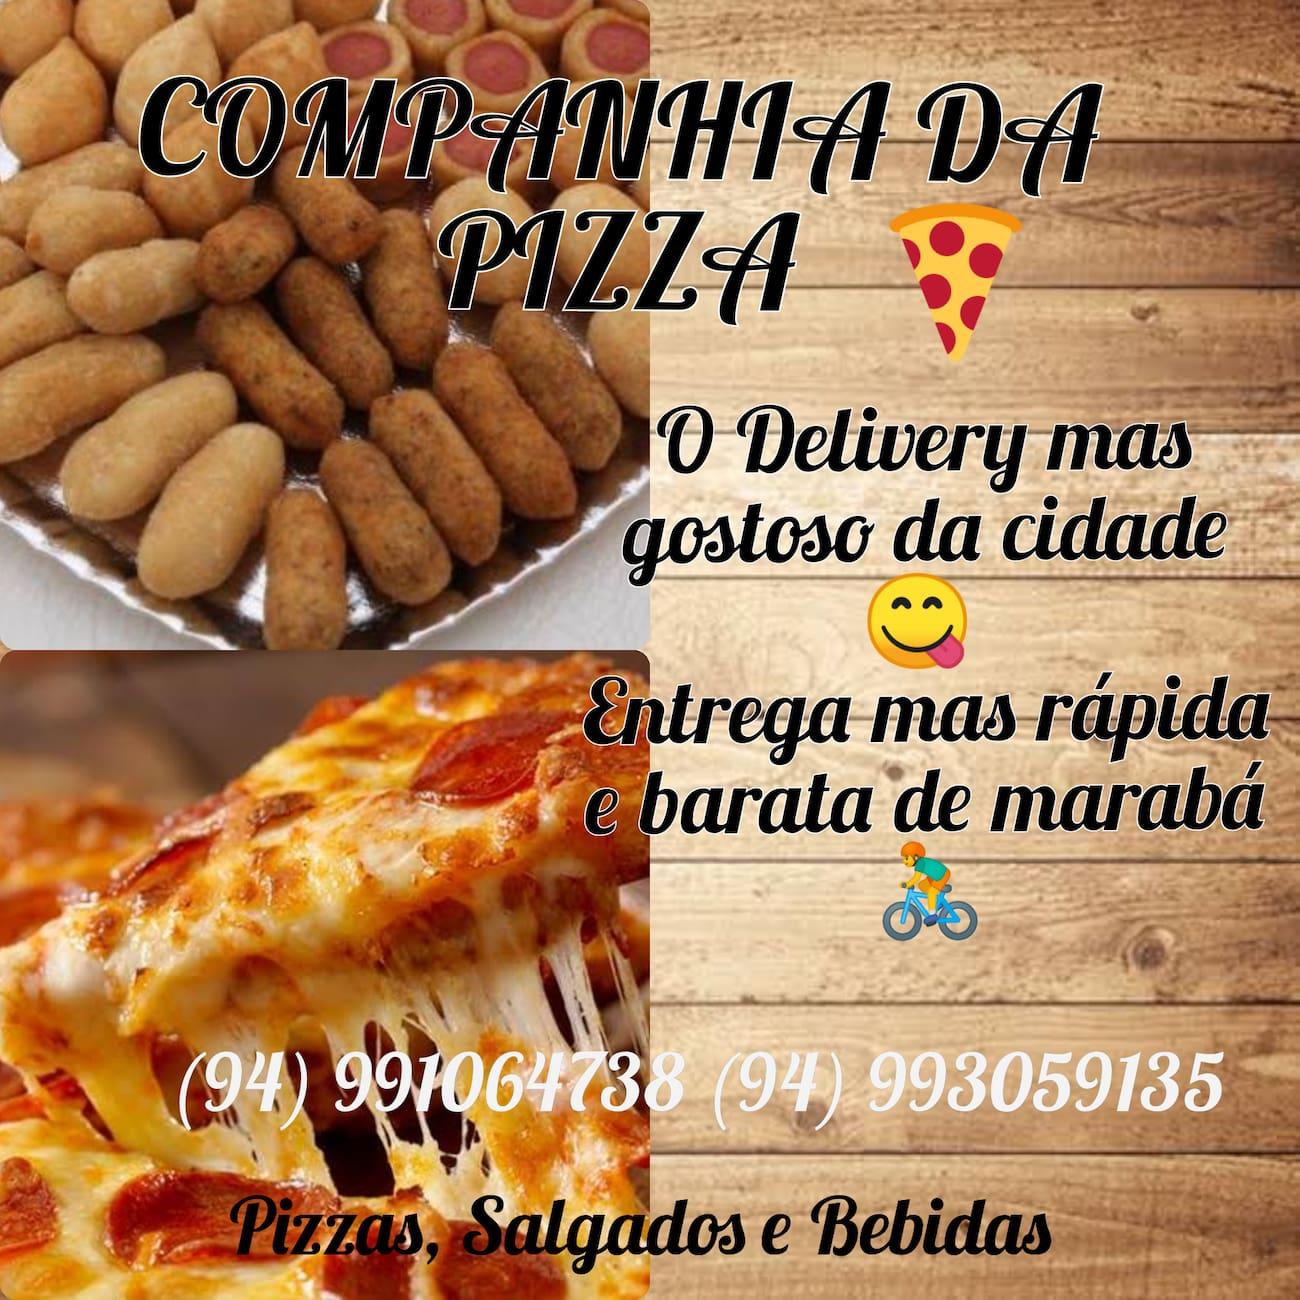 Companhia da Pizza